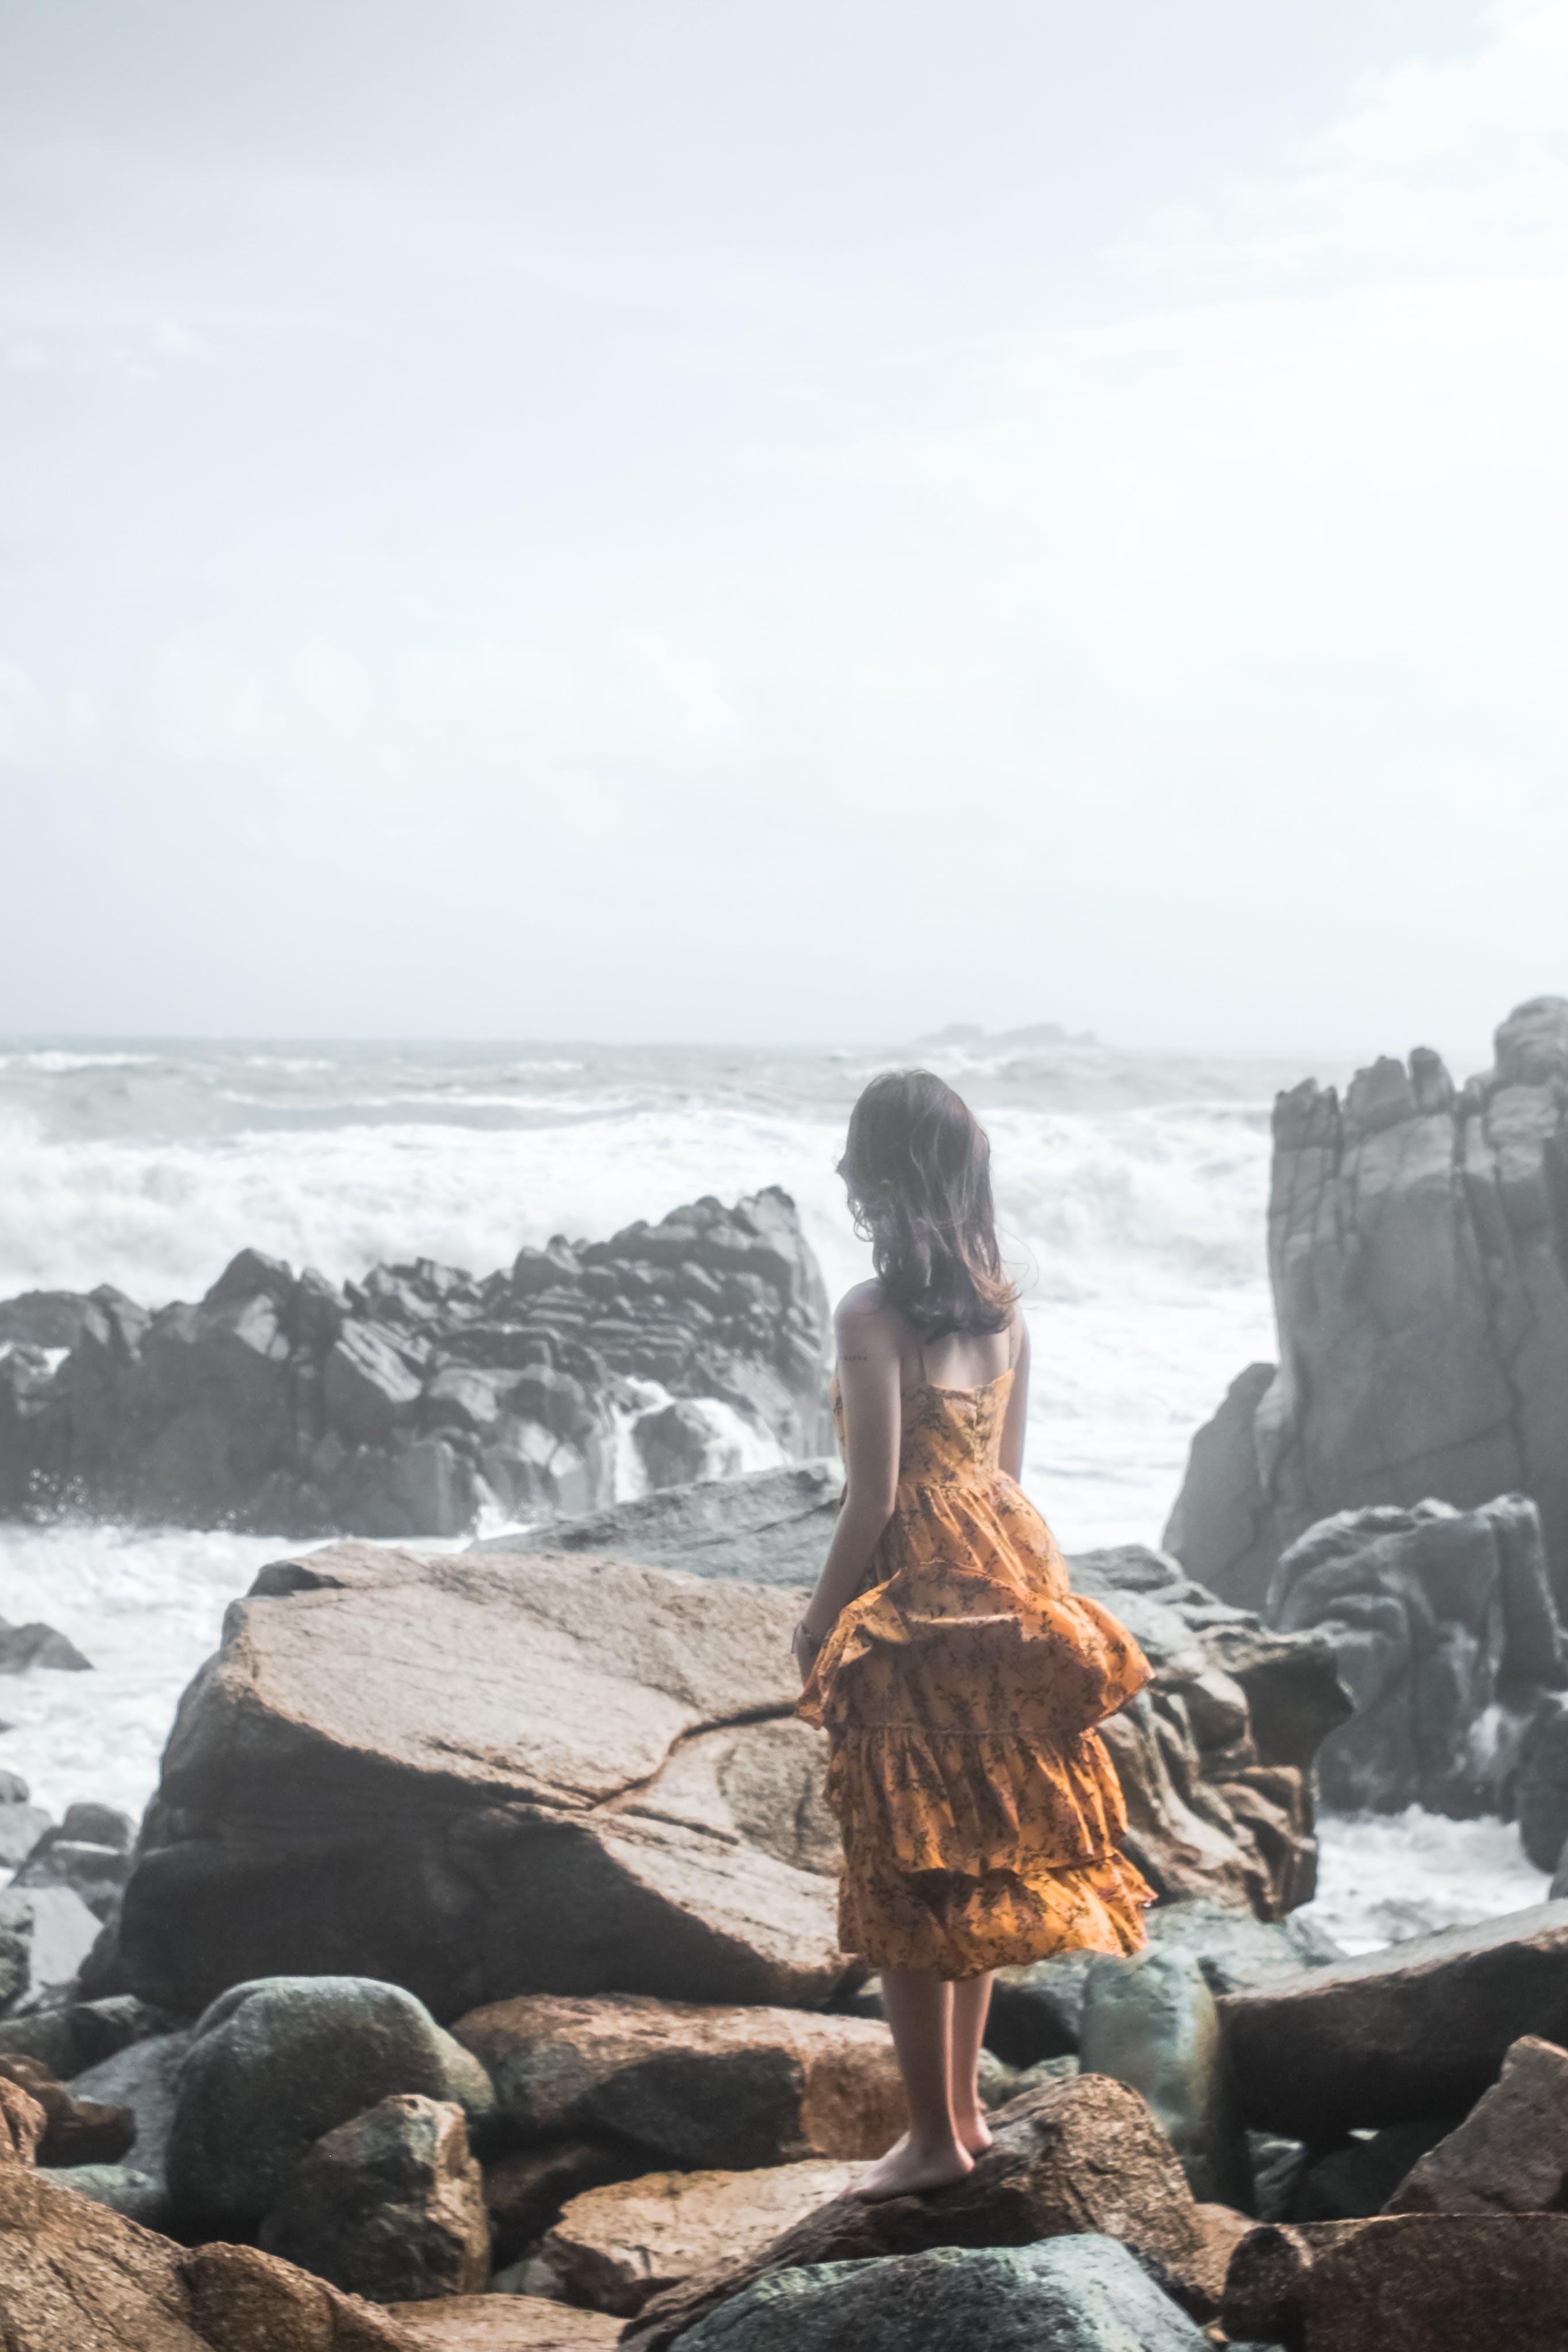 Woman in Orange Dress Standing on Rock Groynes